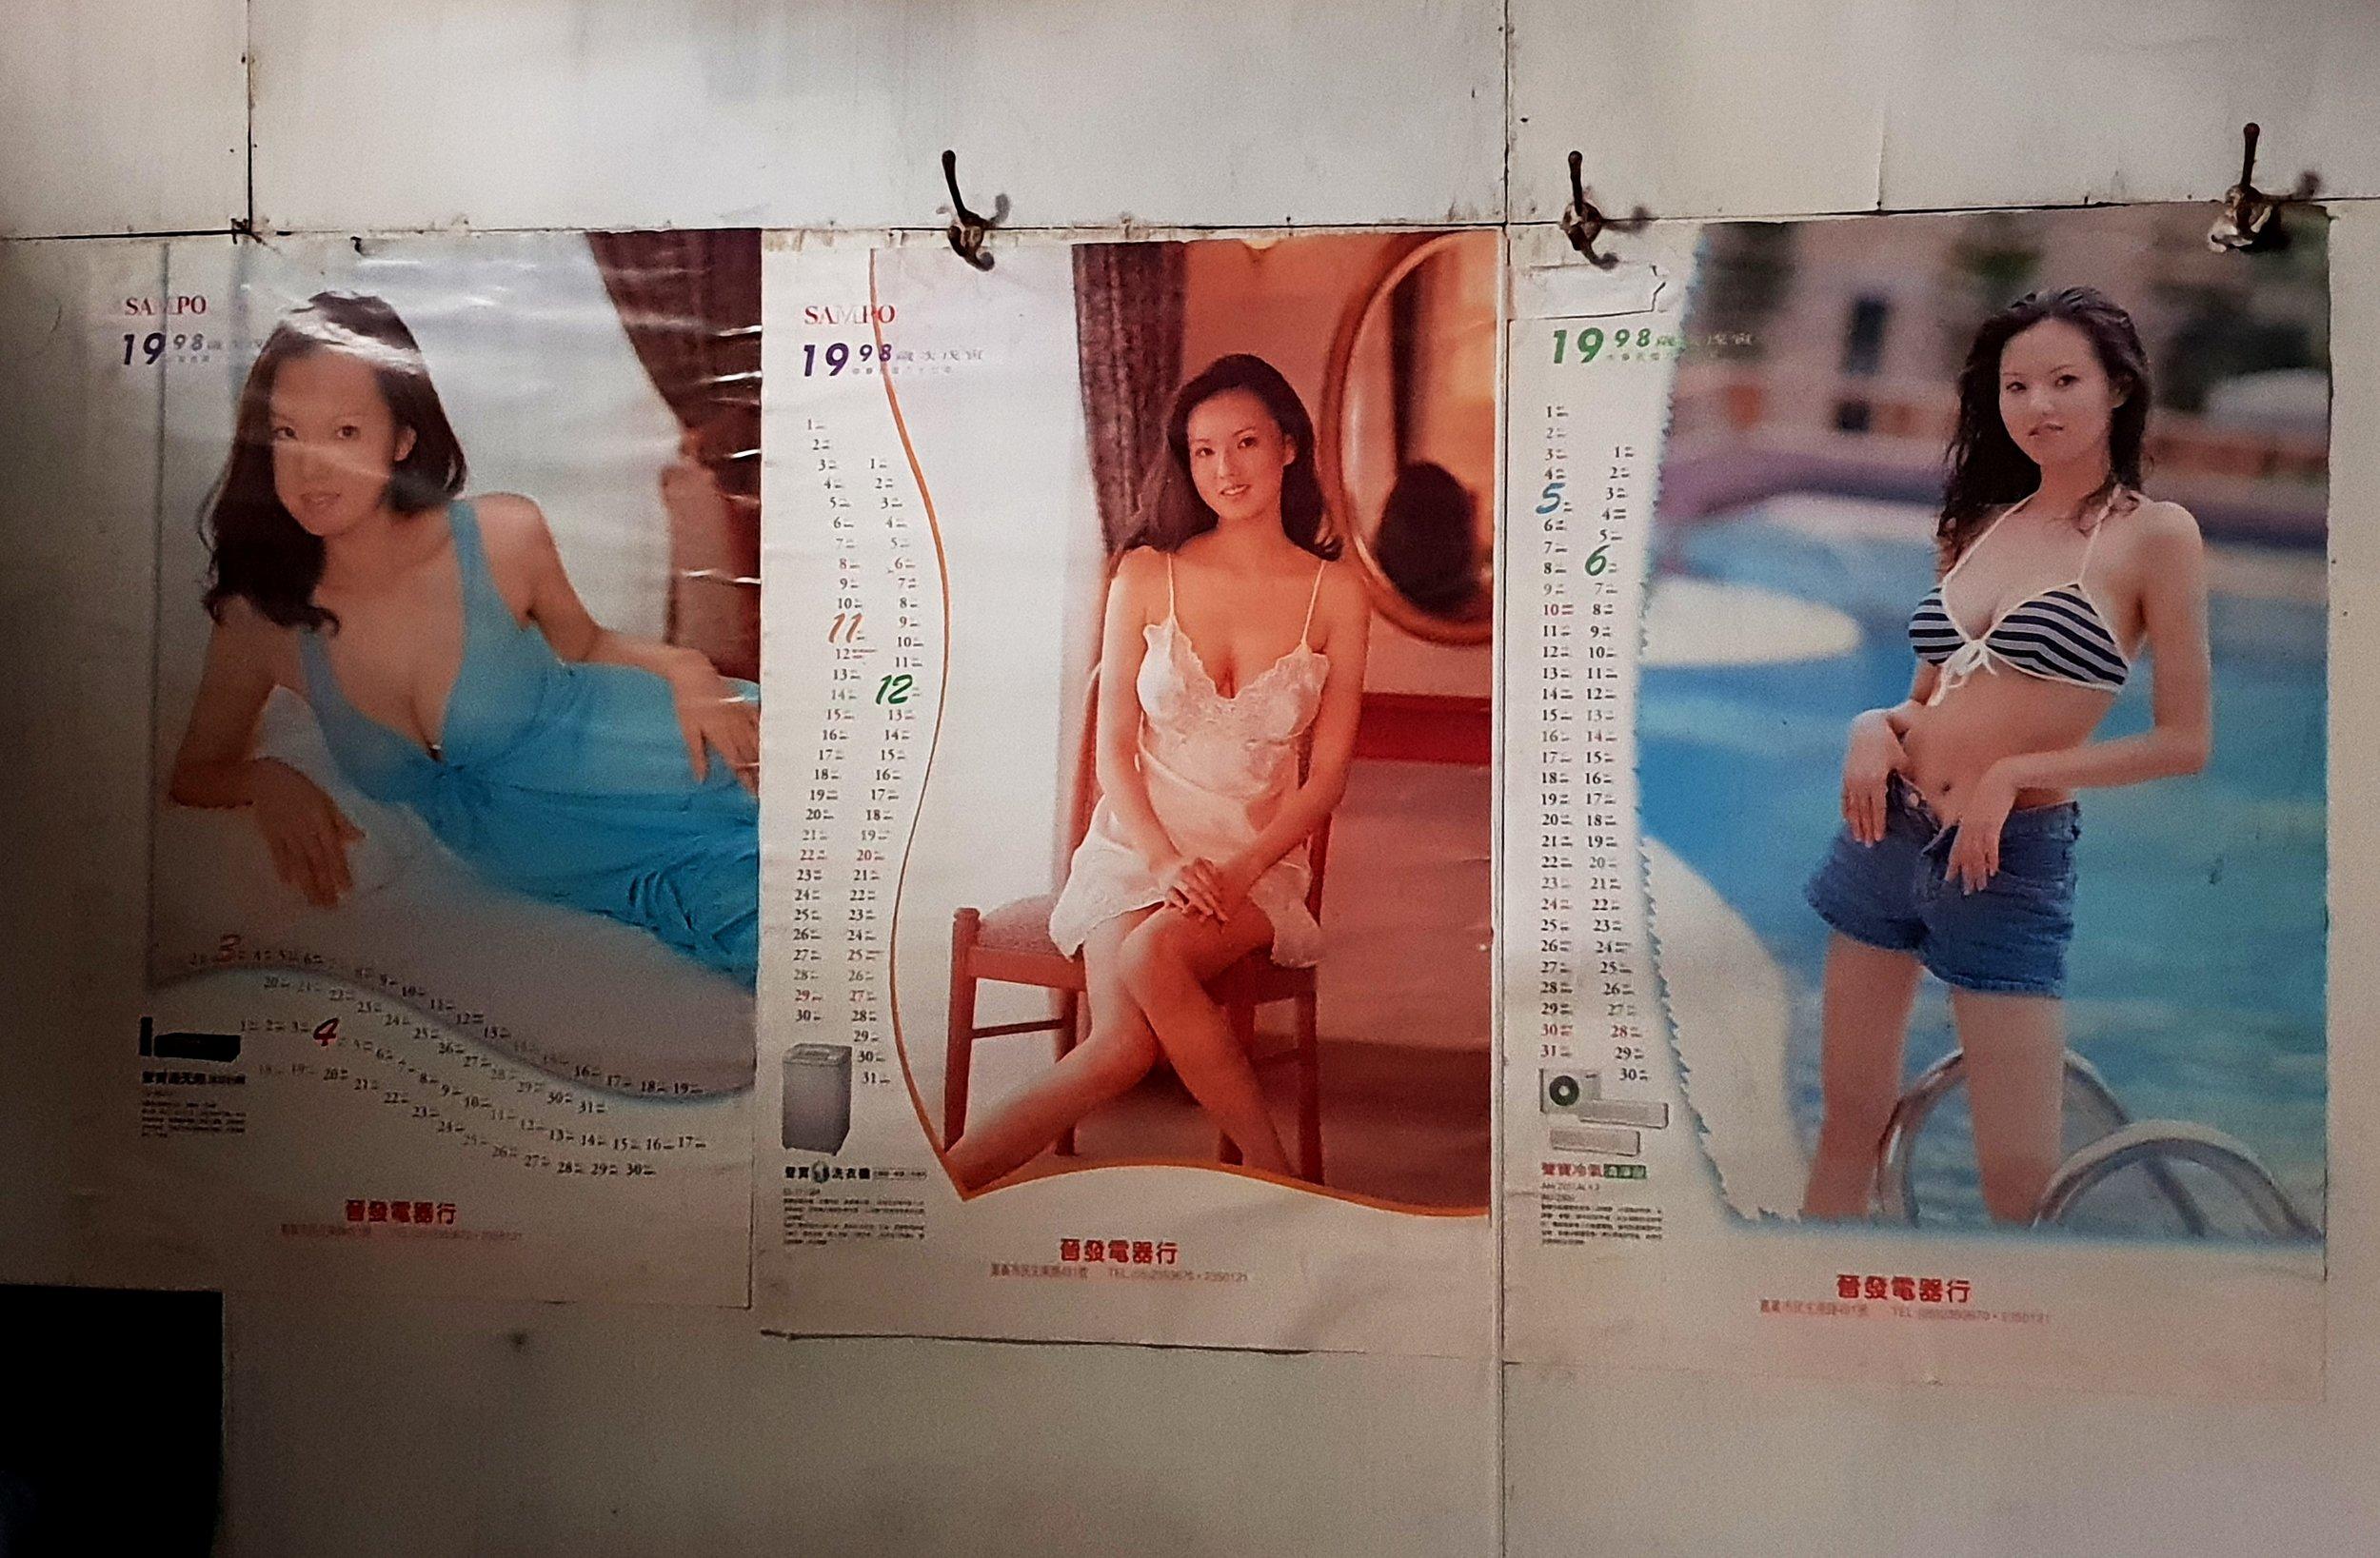 1998 calendar inside the a warehouse home